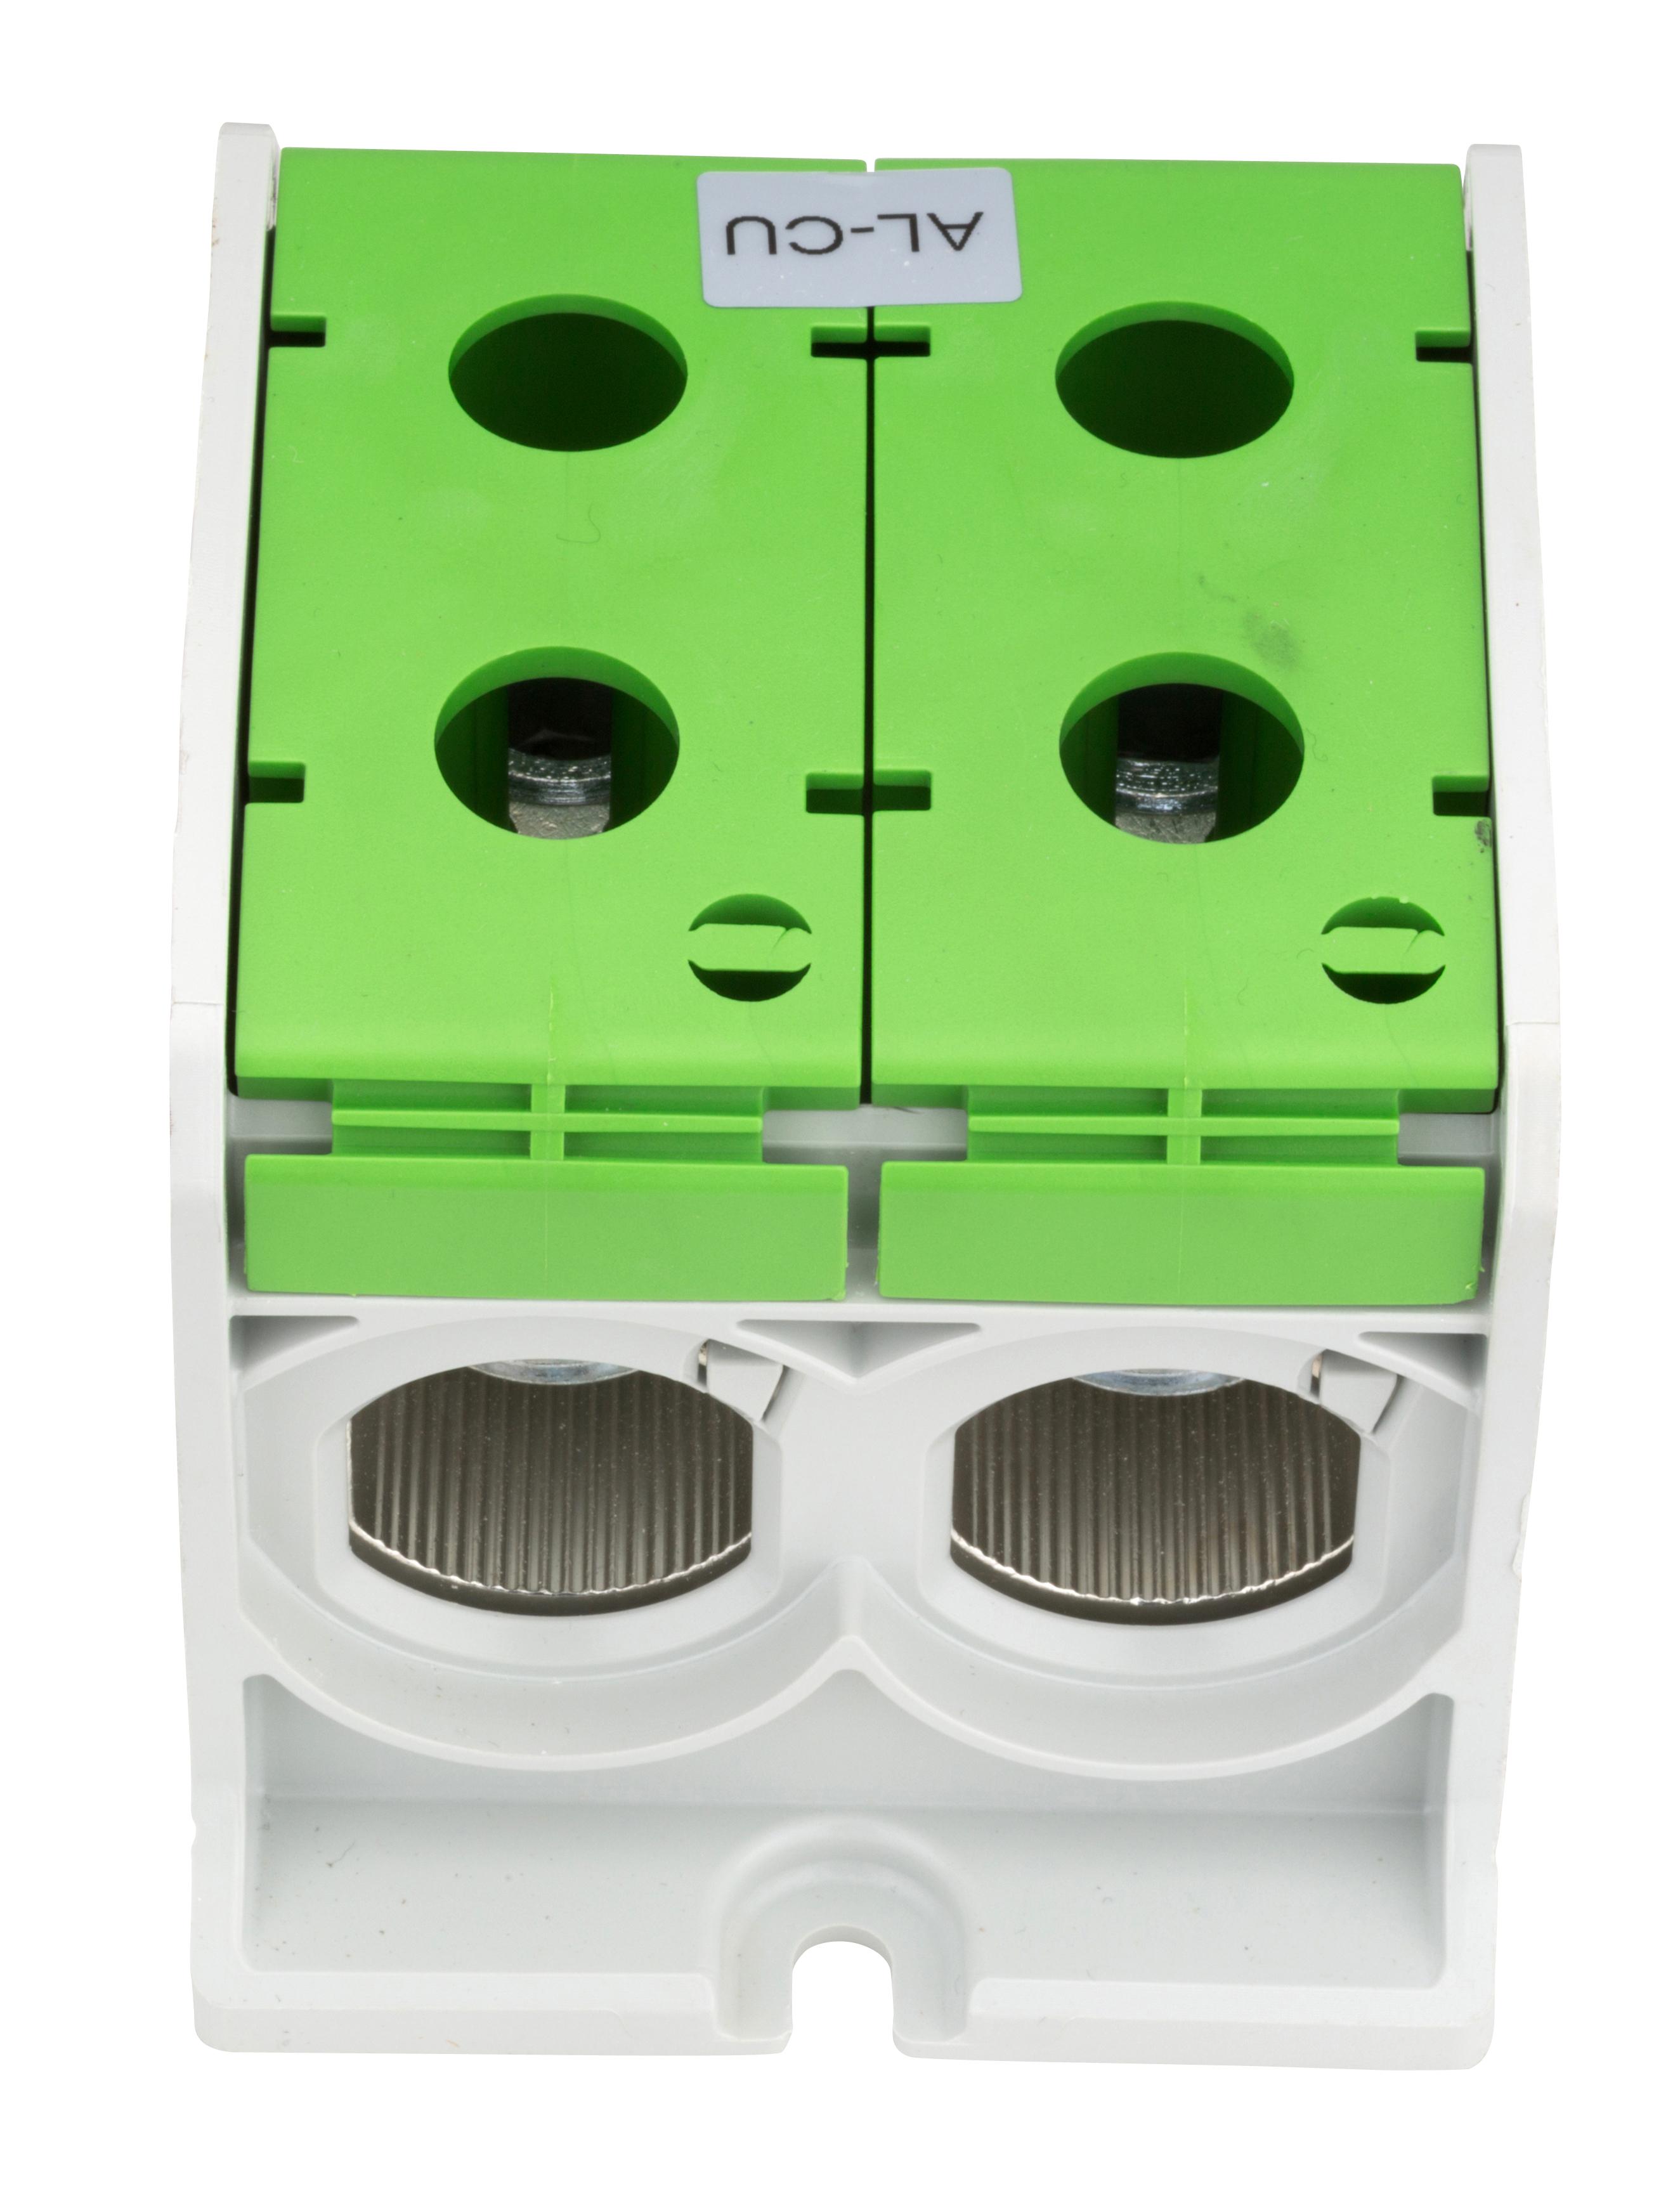 1 Stk Aluminium /Kupfer Klemme, 1-polig, Doppel 300mm² grün IKA21736--